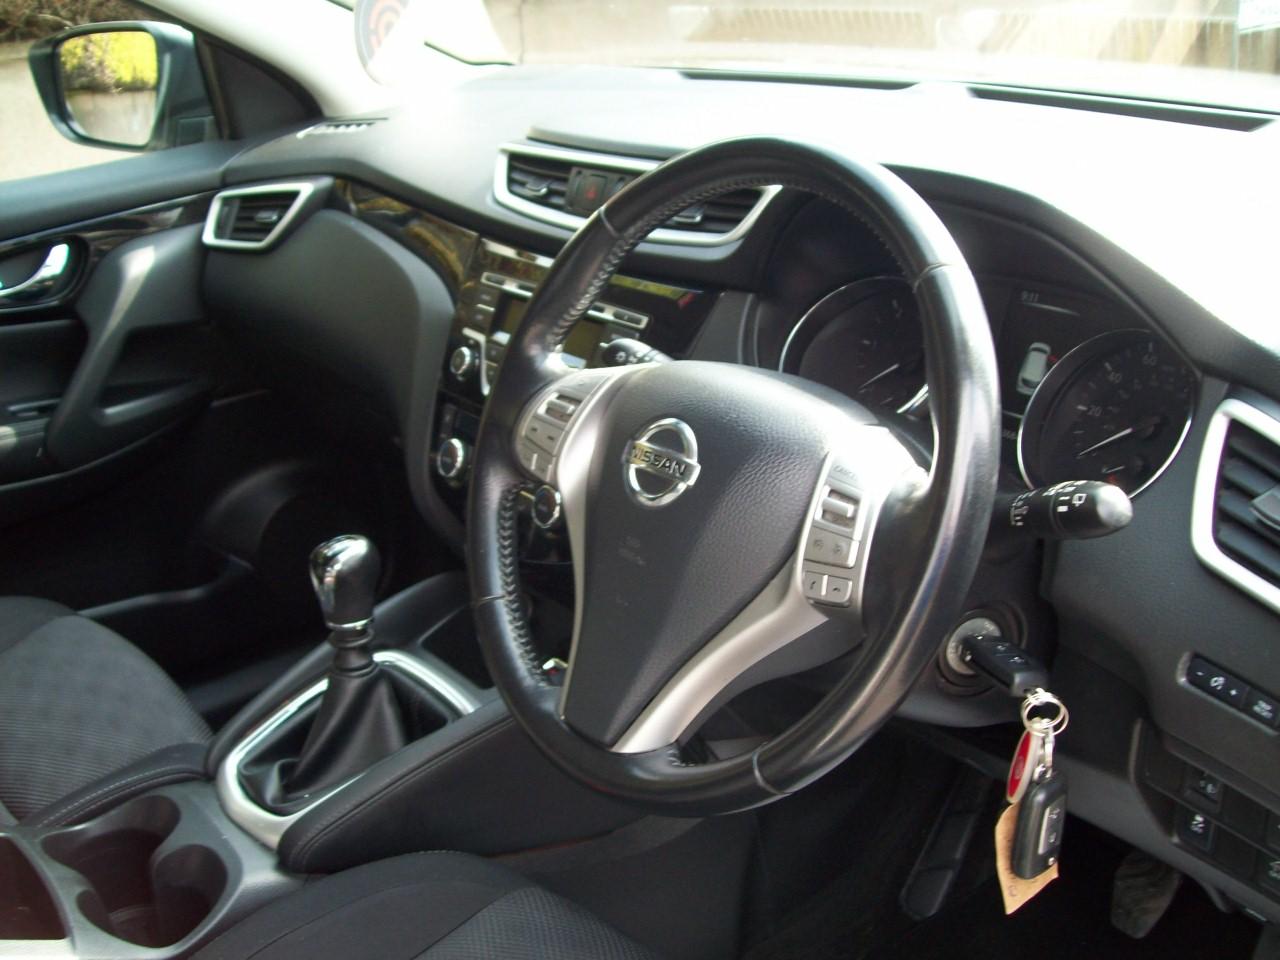 Nissan QASHQAI ACENTA SMART VIS DCI